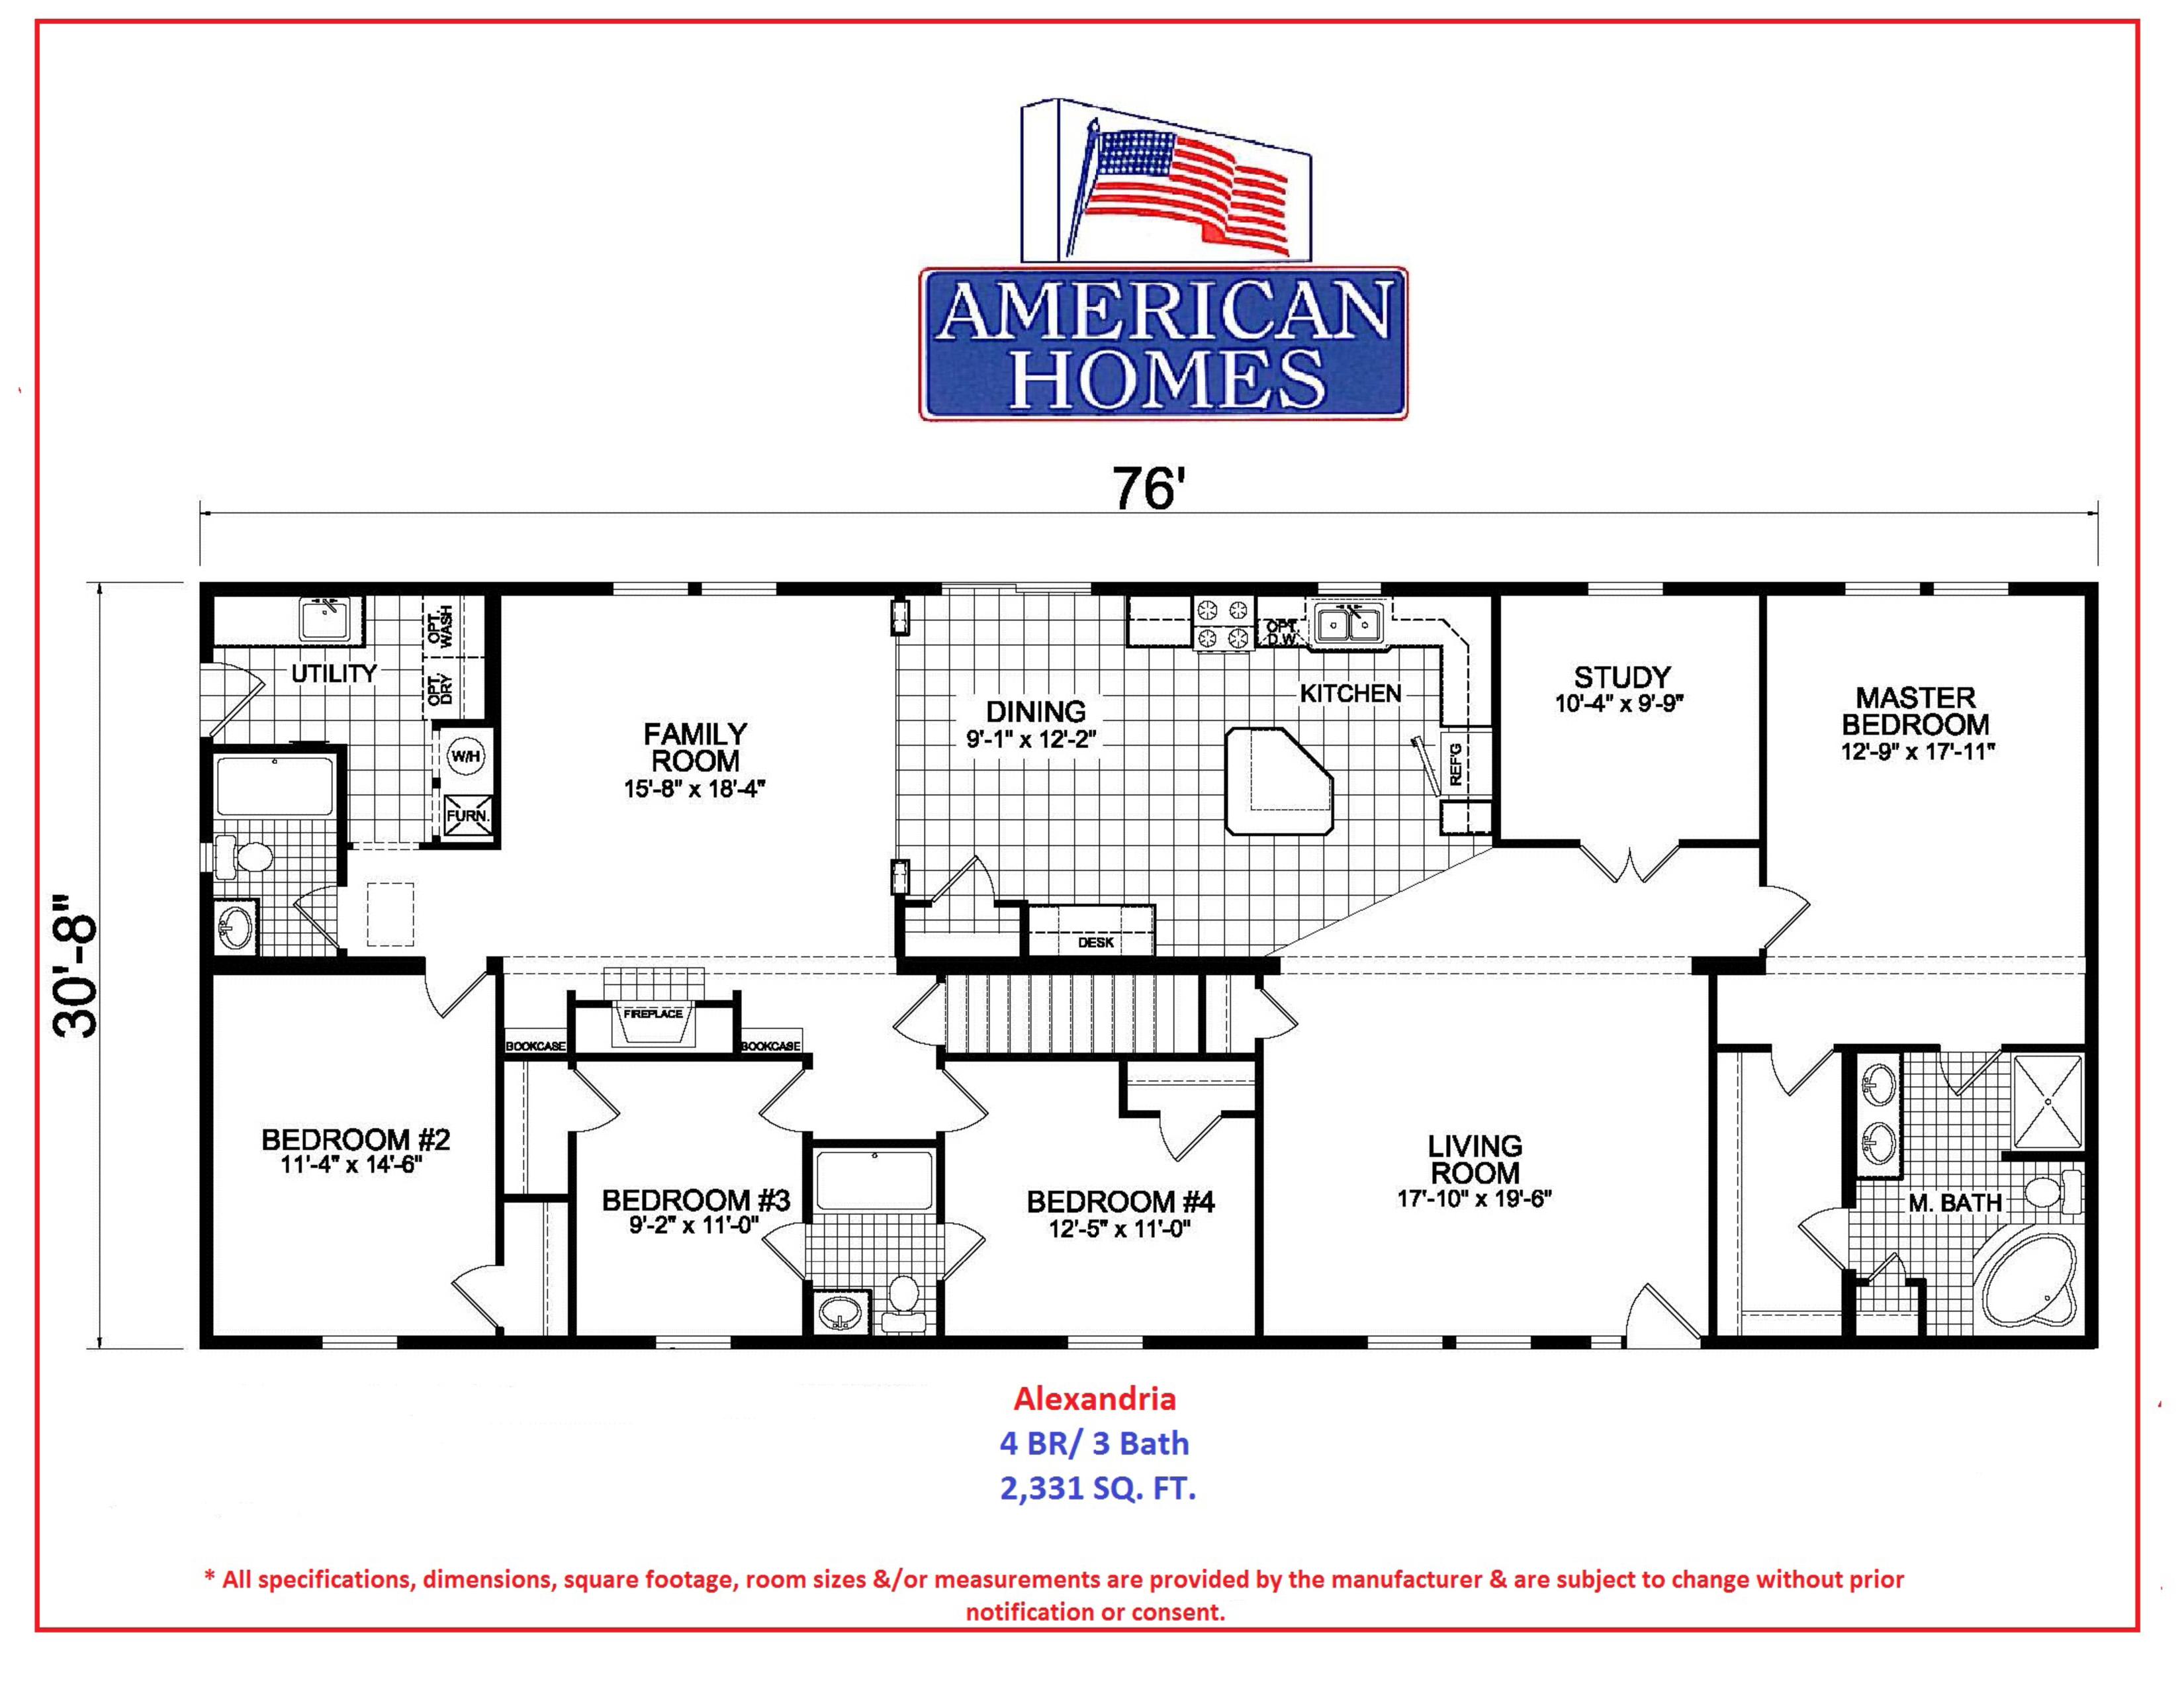 alexandria new american homes